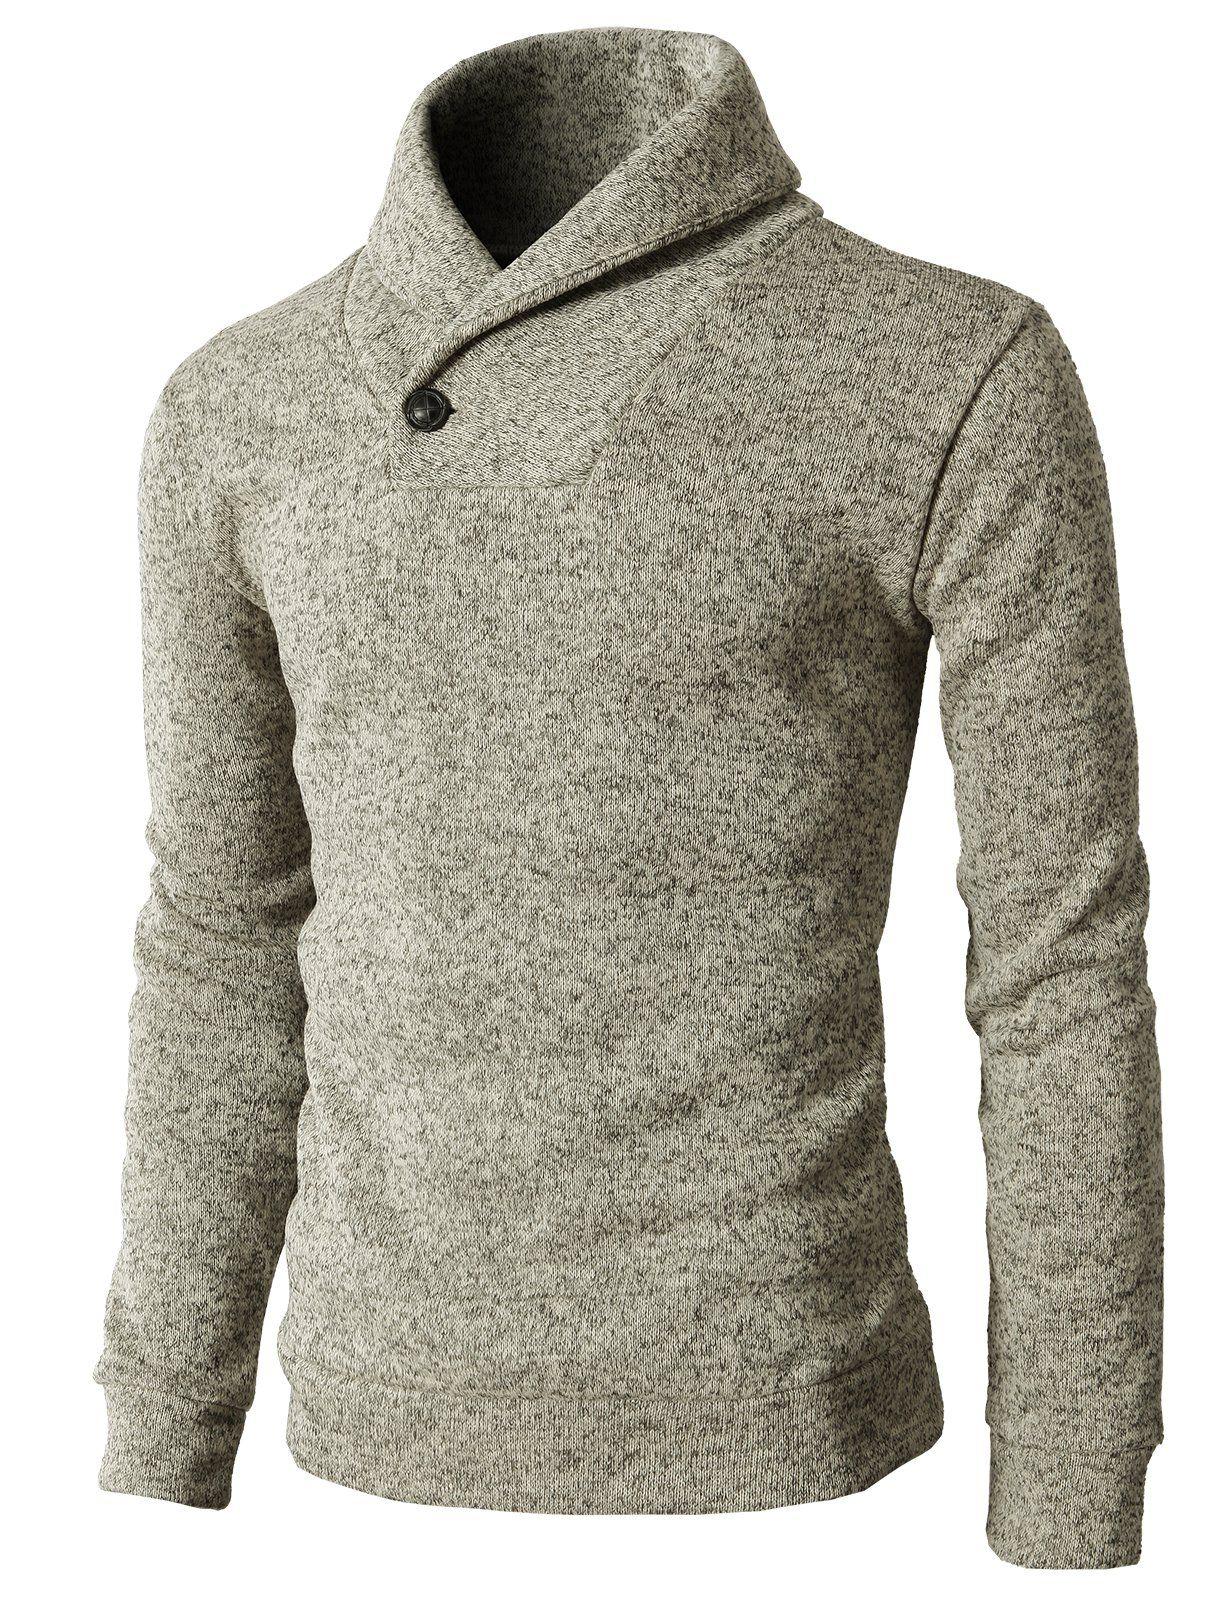 Robot Check | Mens fashion sweaters, Men sweater, Men casual